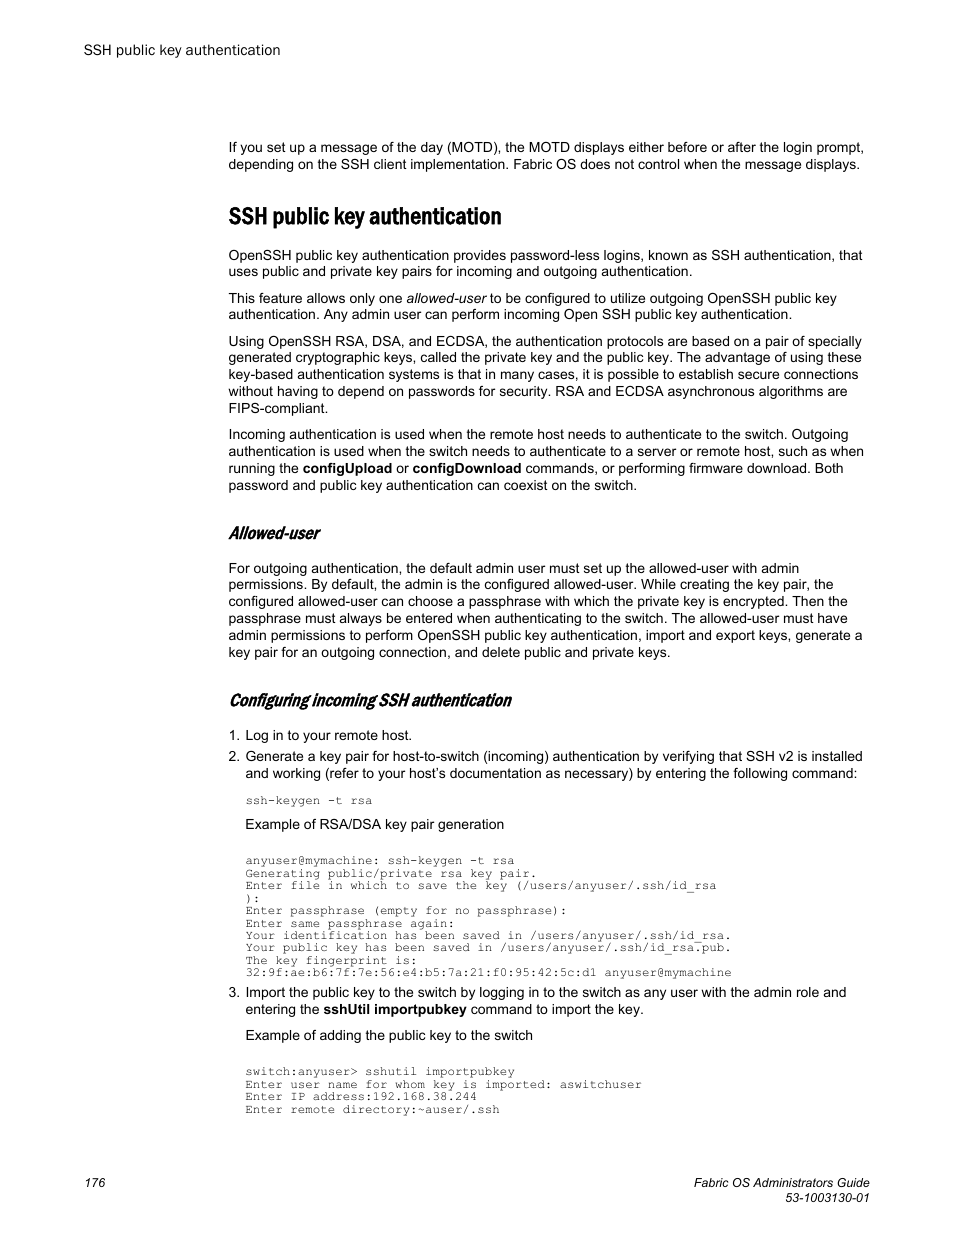 Ssh public key authentication, Allowed-user, Configuring